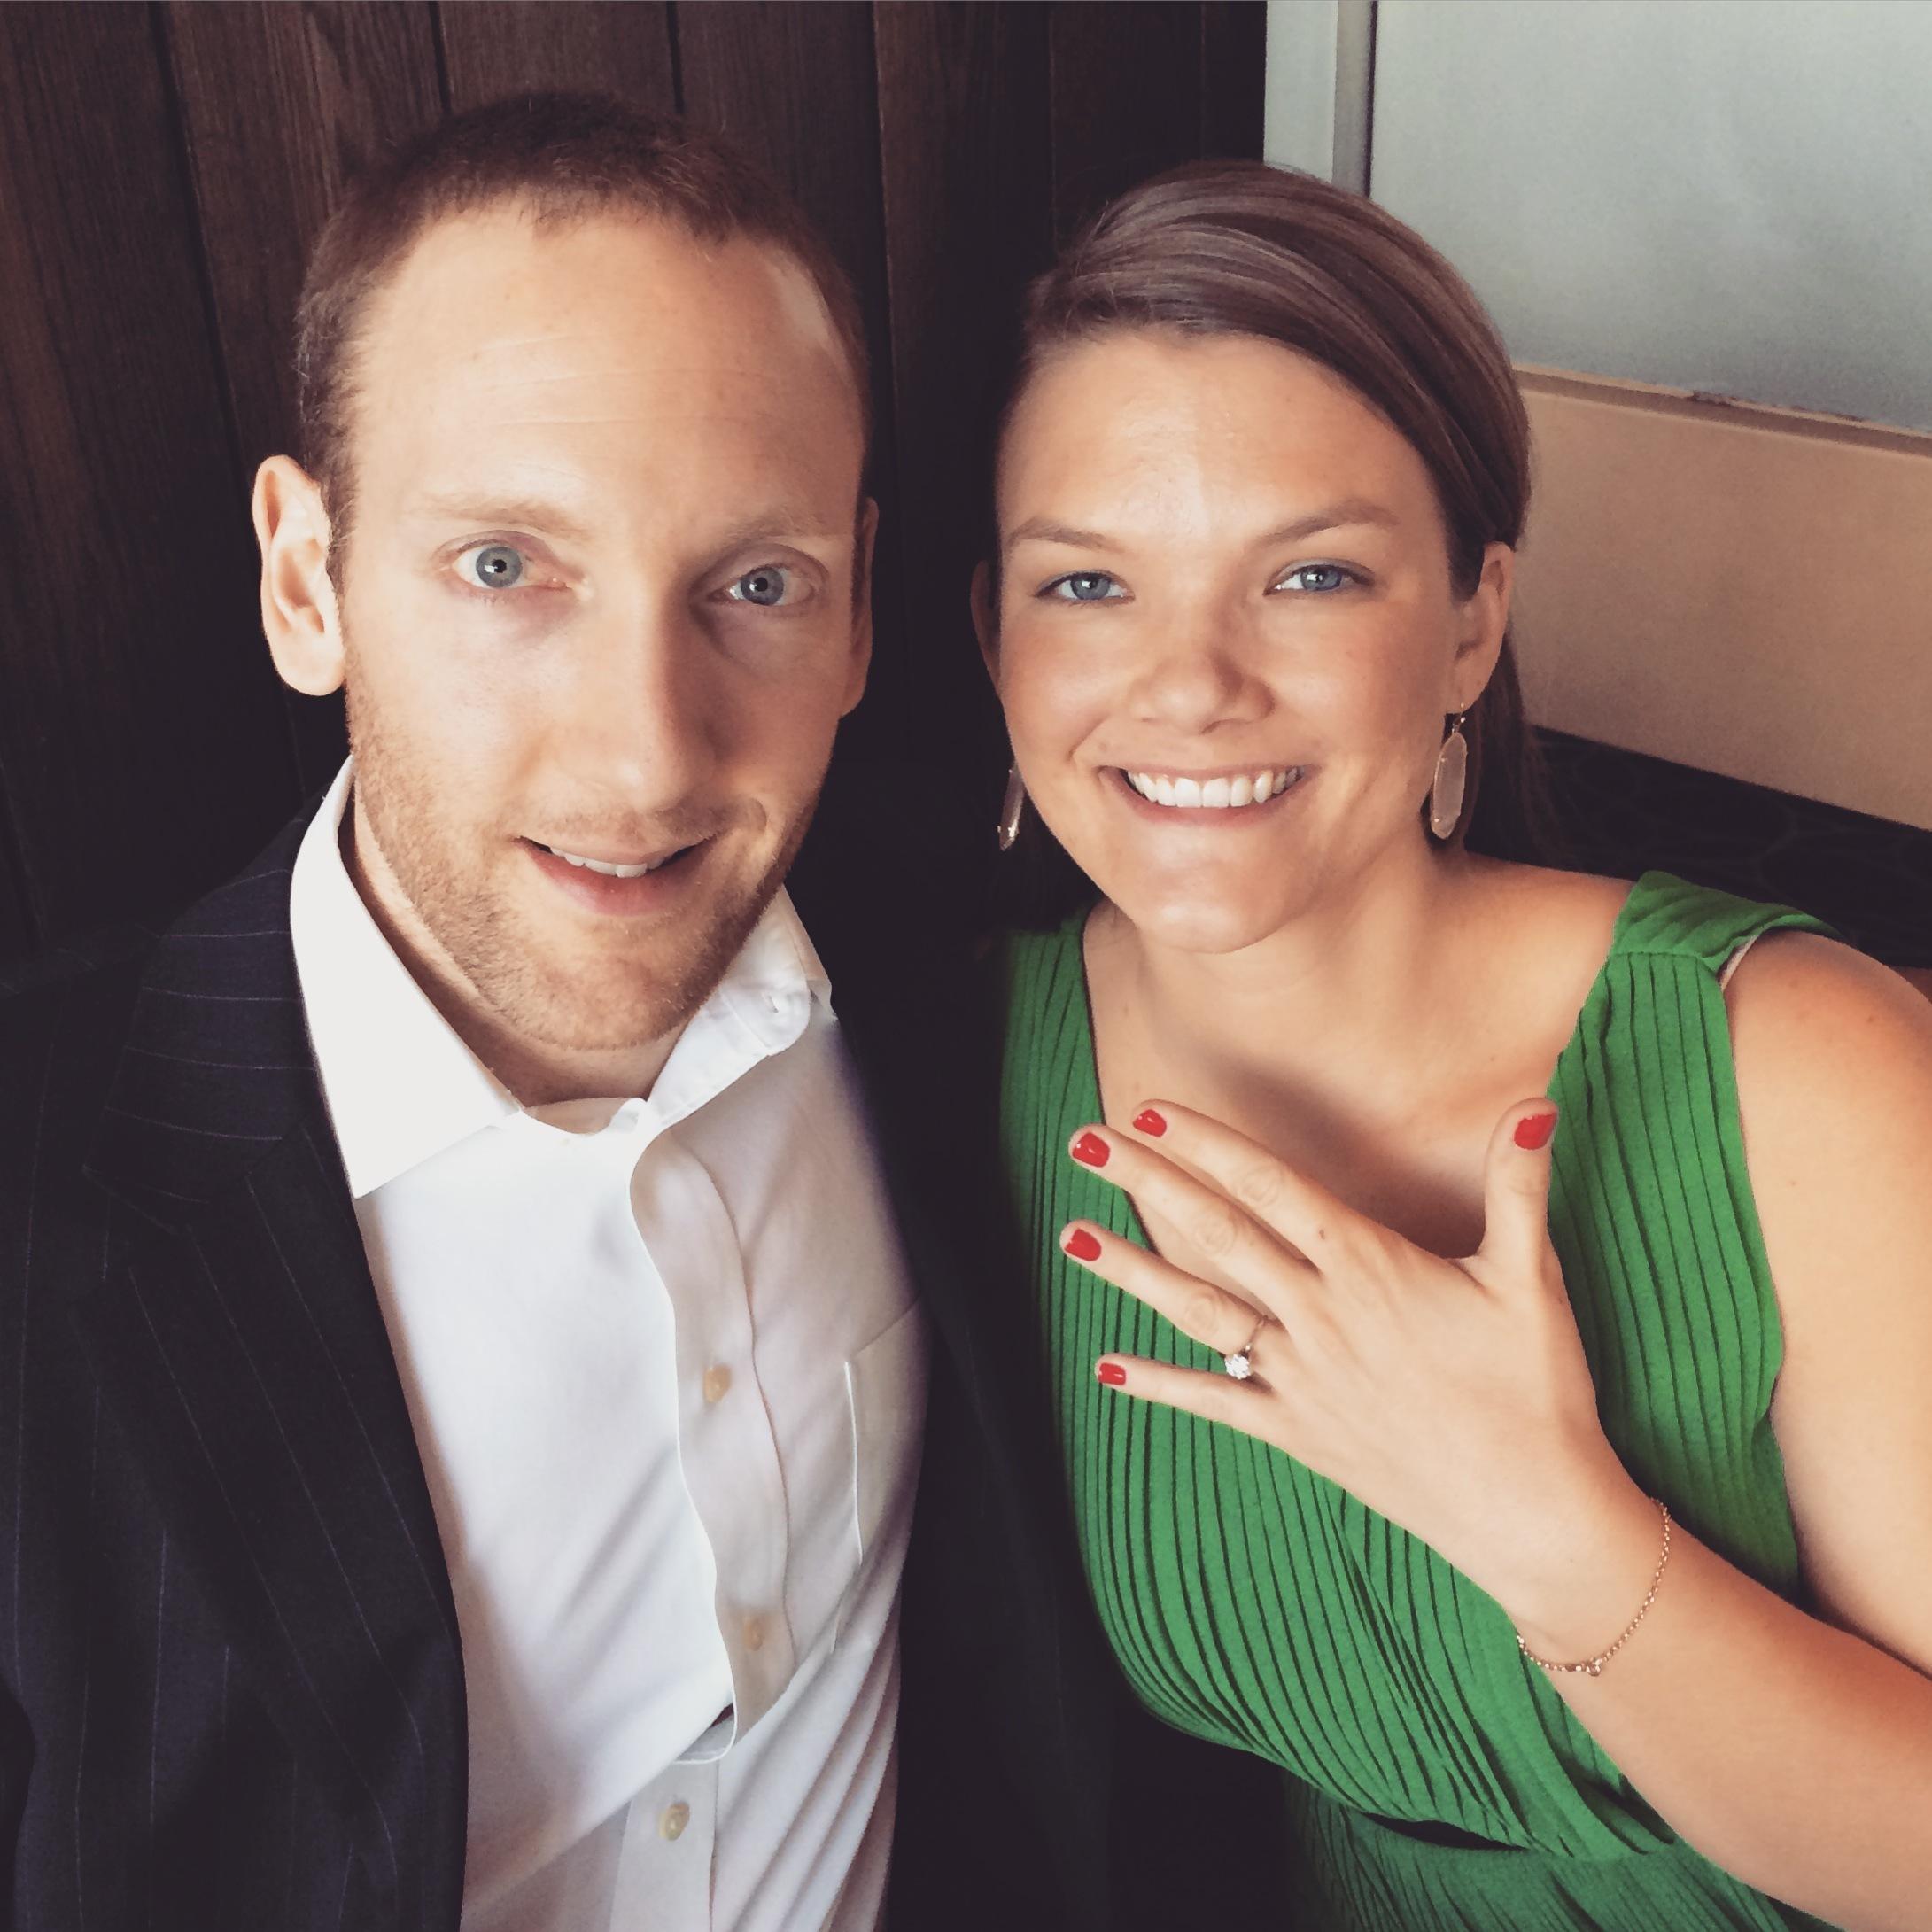 michael and hannah wedding website wedding on oct 8 2016